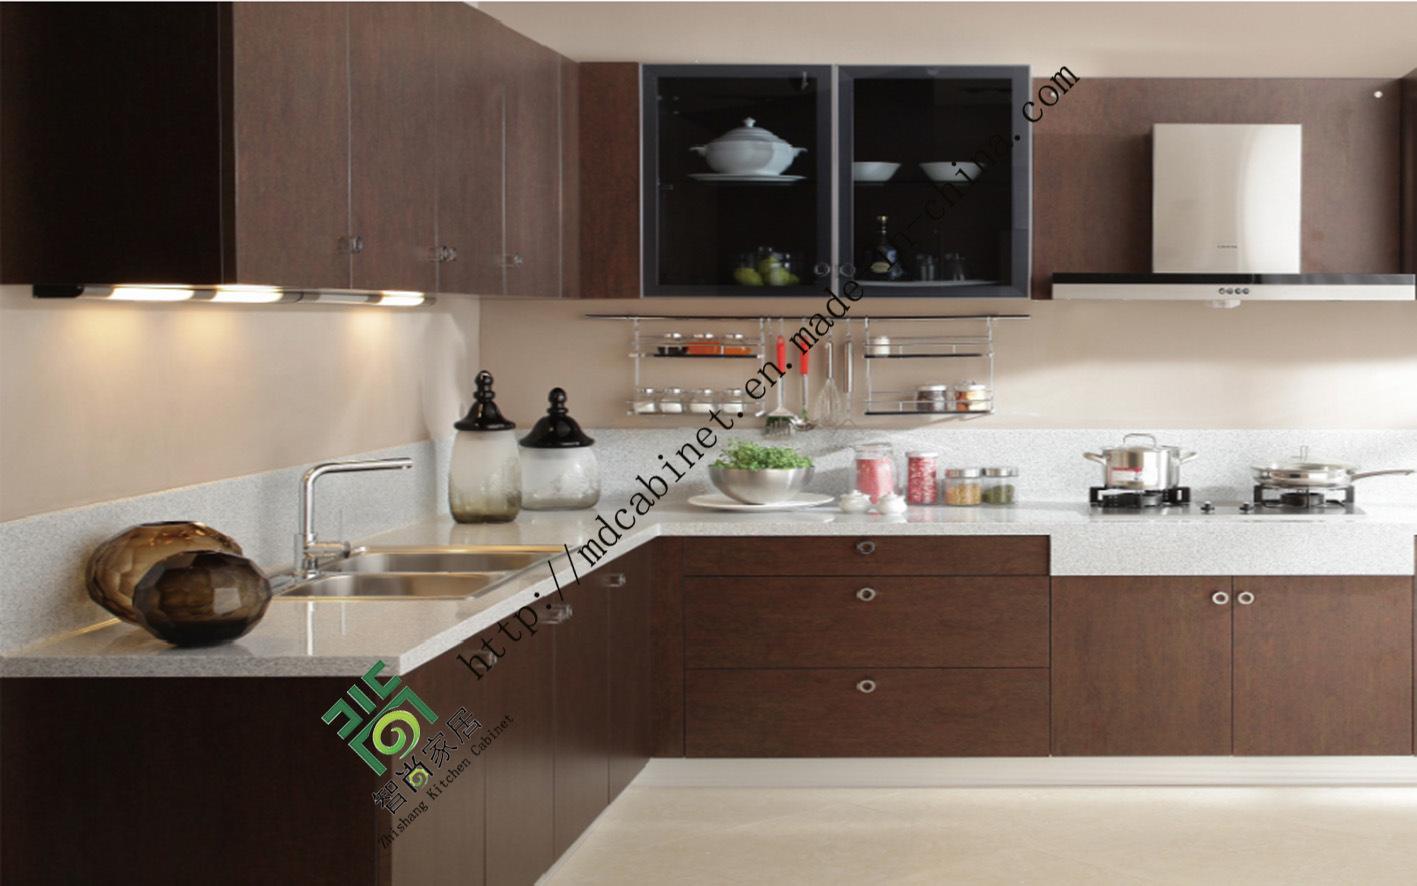 melamine kitchen cabinets supplies online china mdf boards cabinet zs 01 photos